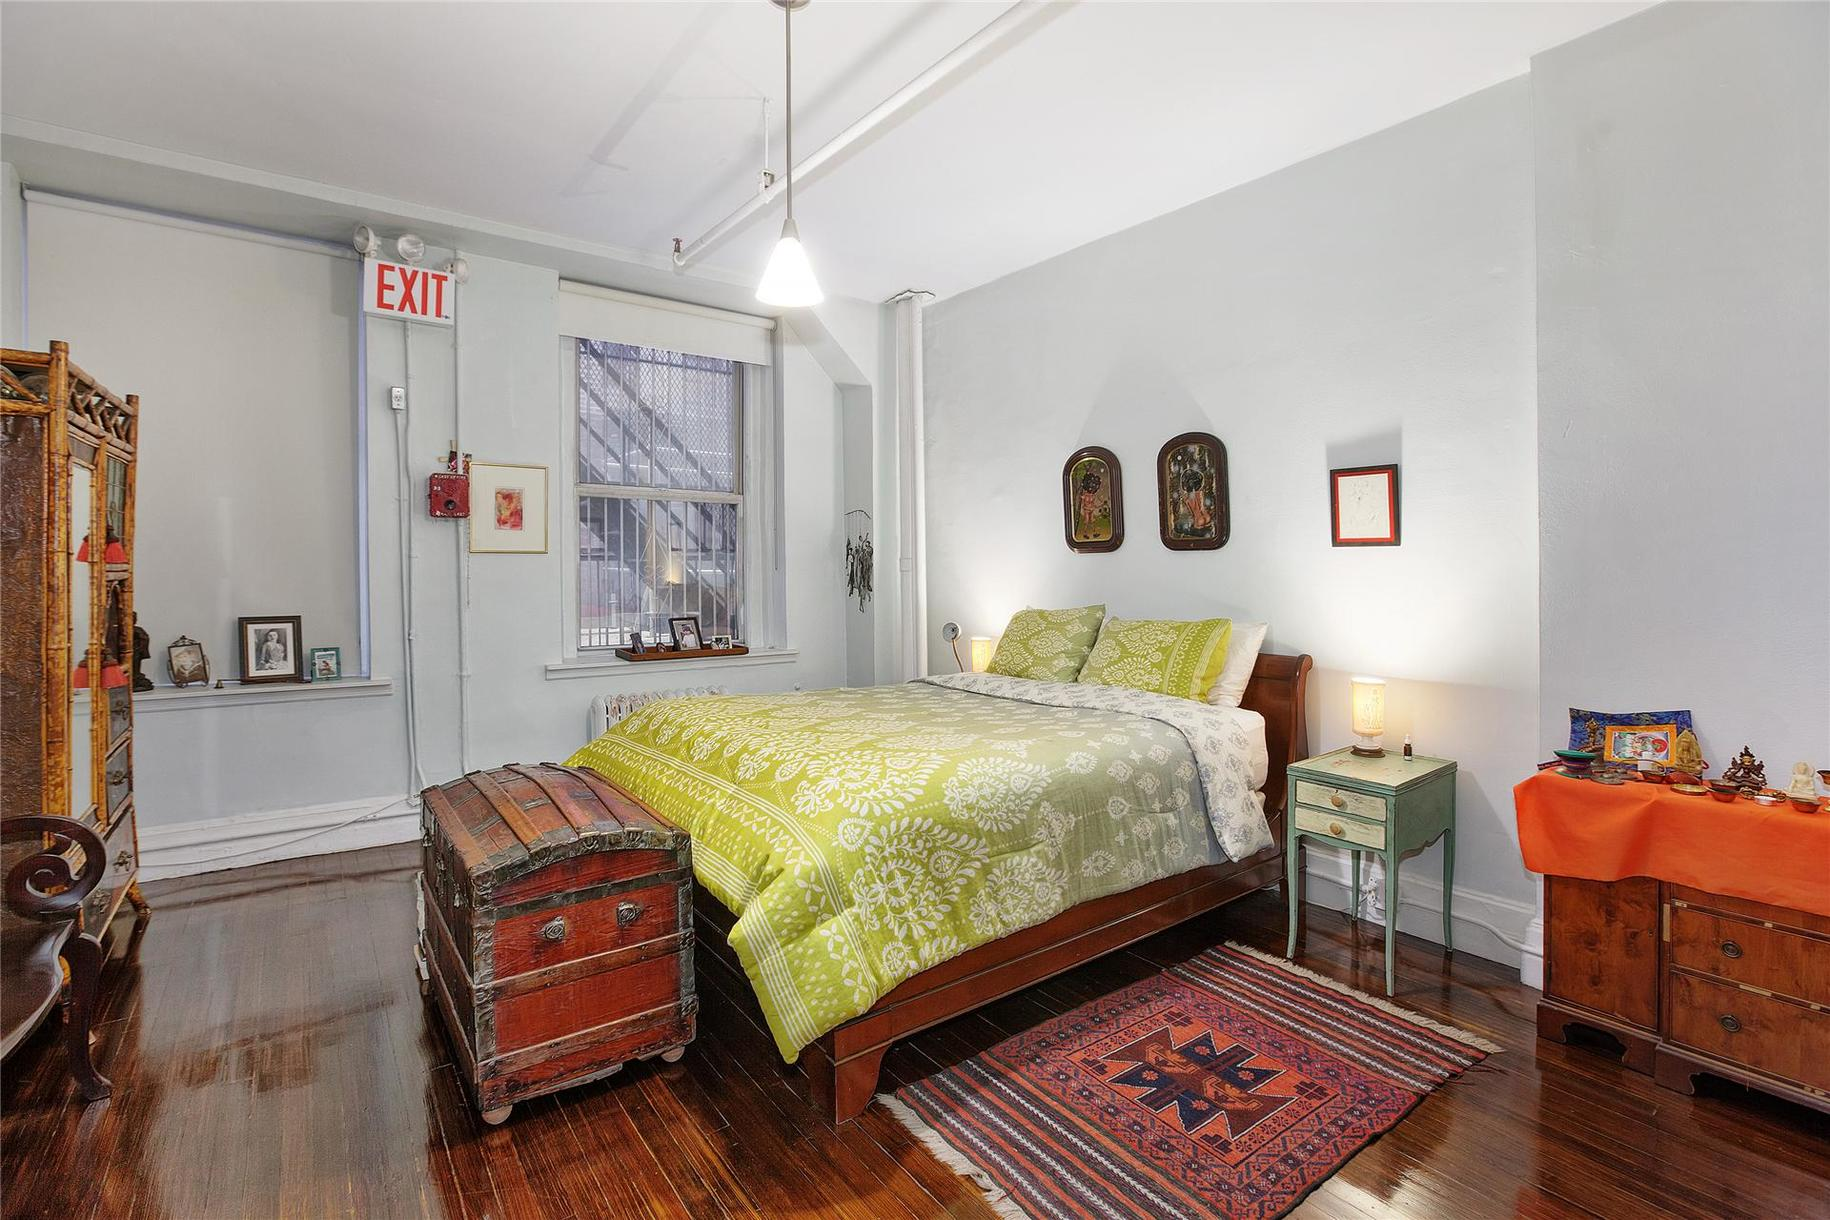 4 West 22nd Street, Cool Listing, Lofts, Chelsea, Chelsea Loft for Rent, Rentals